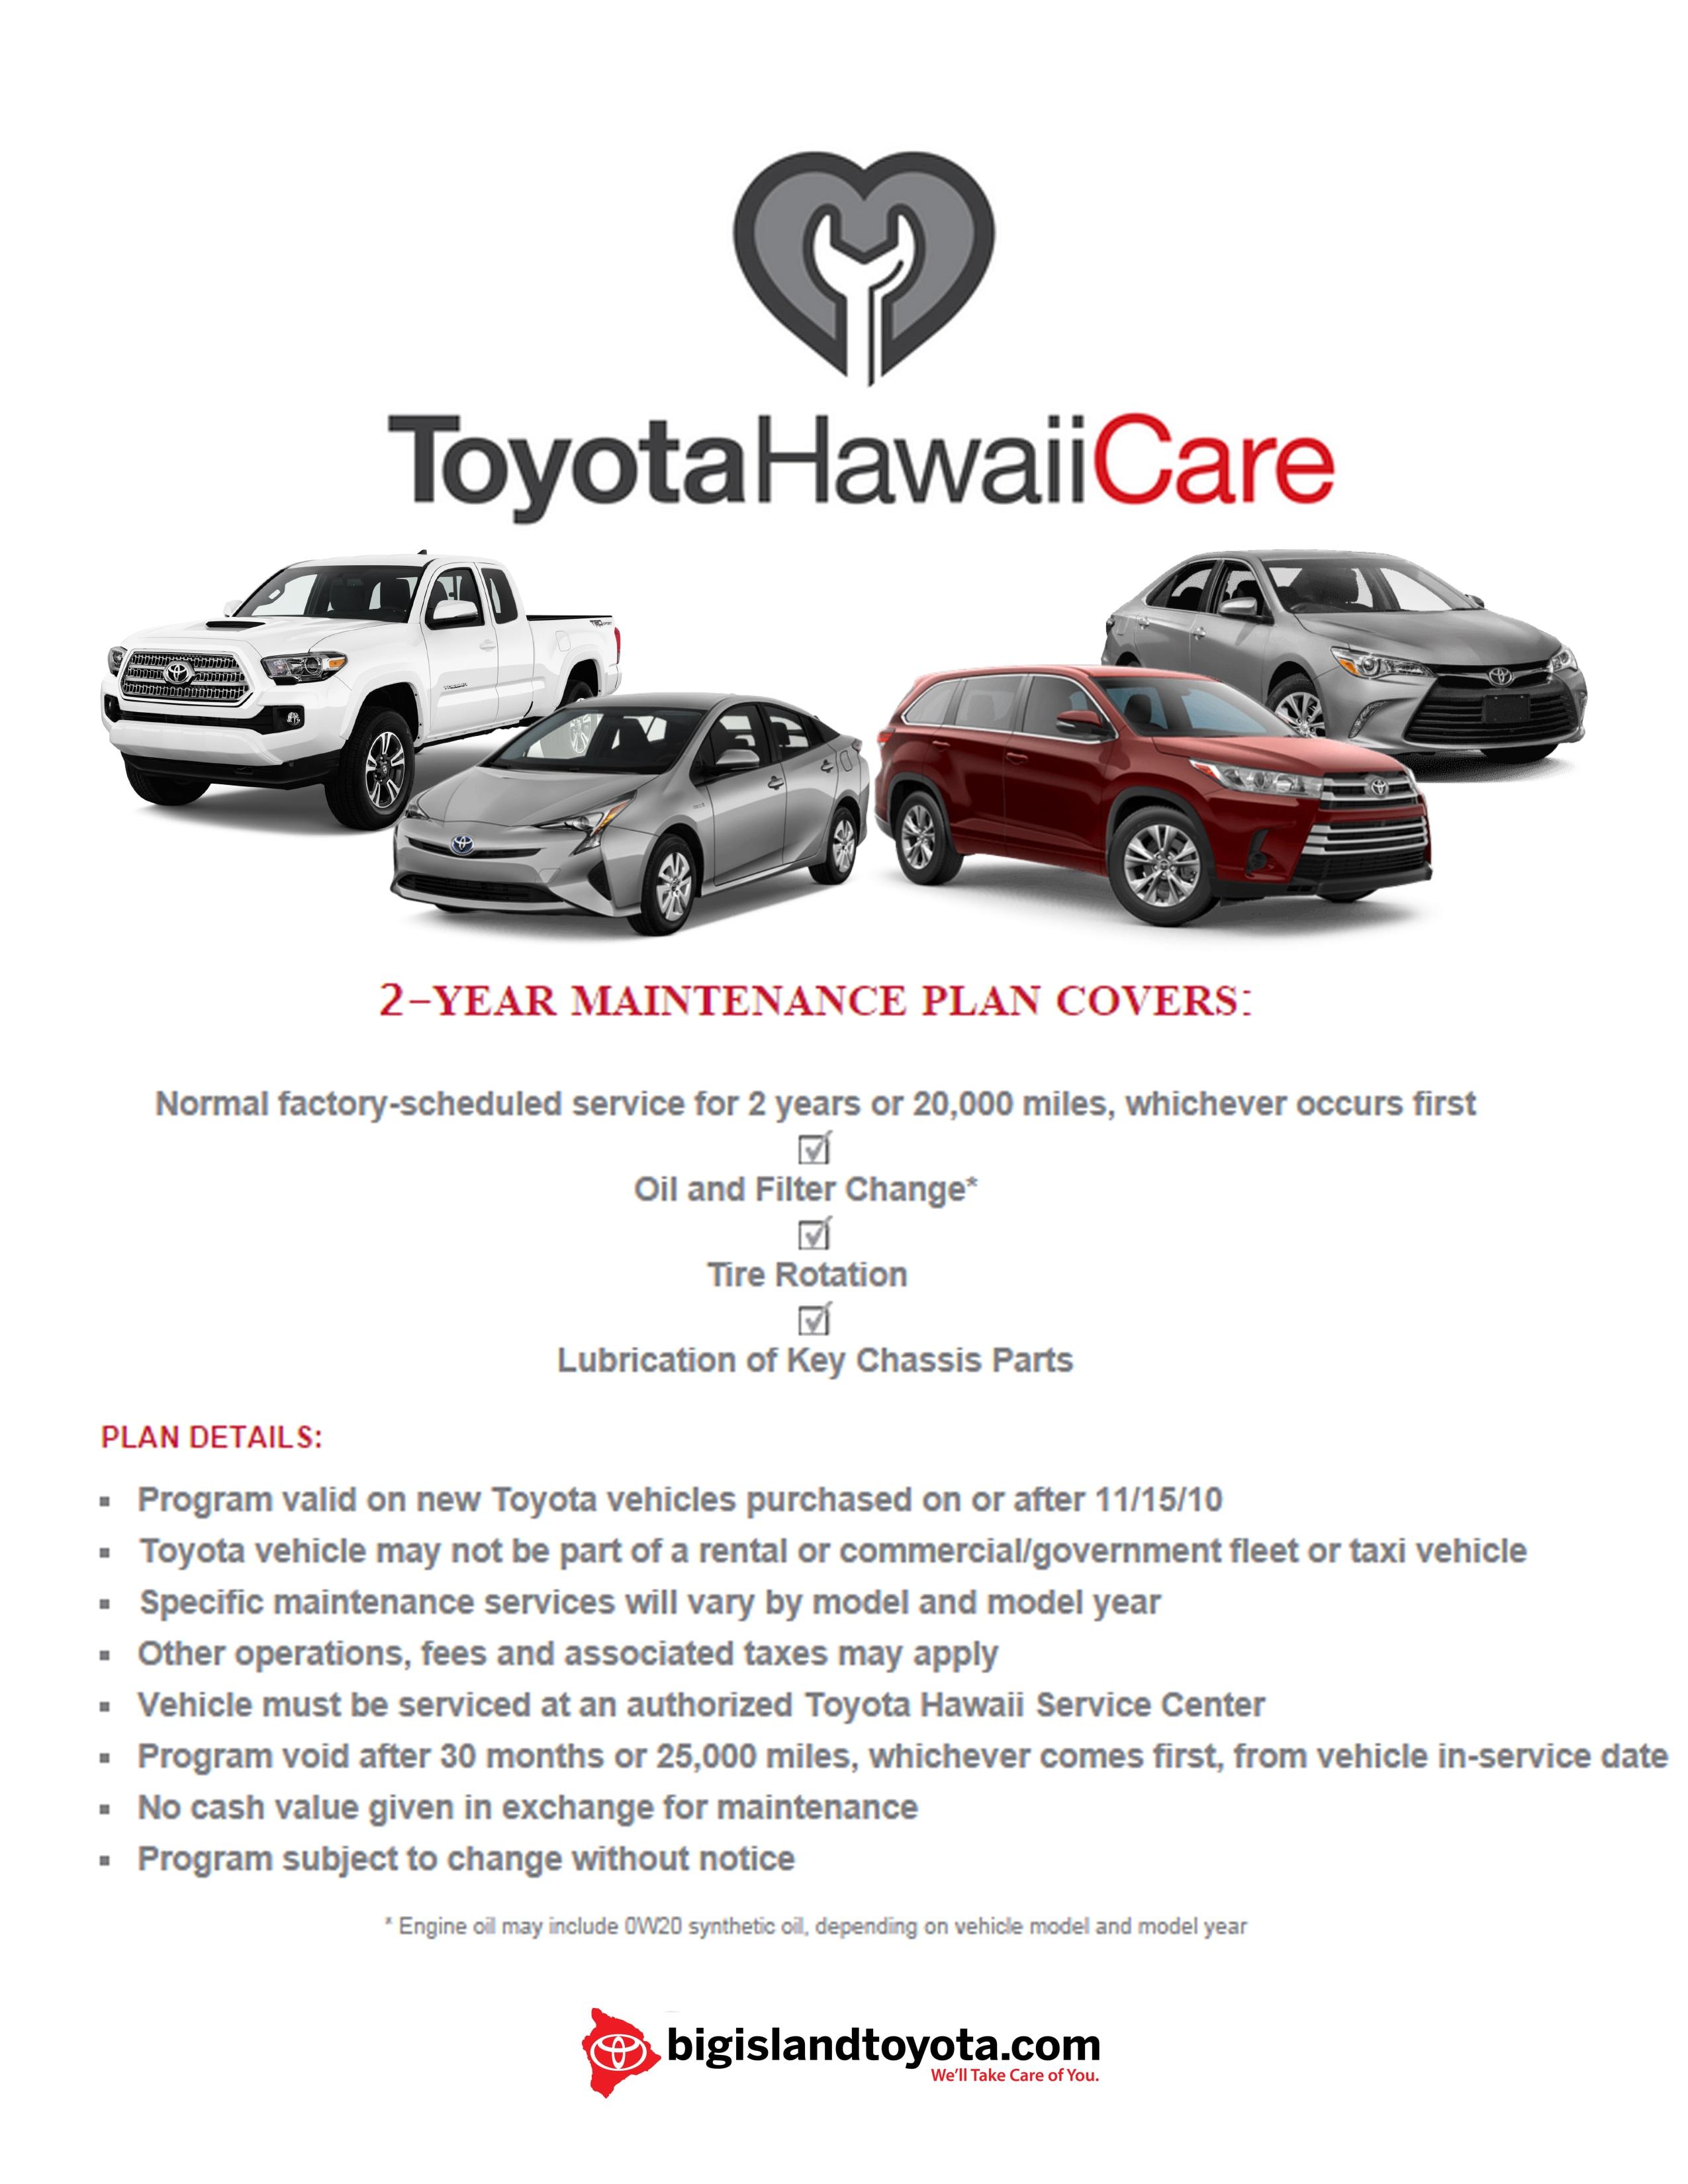 Toyota hawaii care